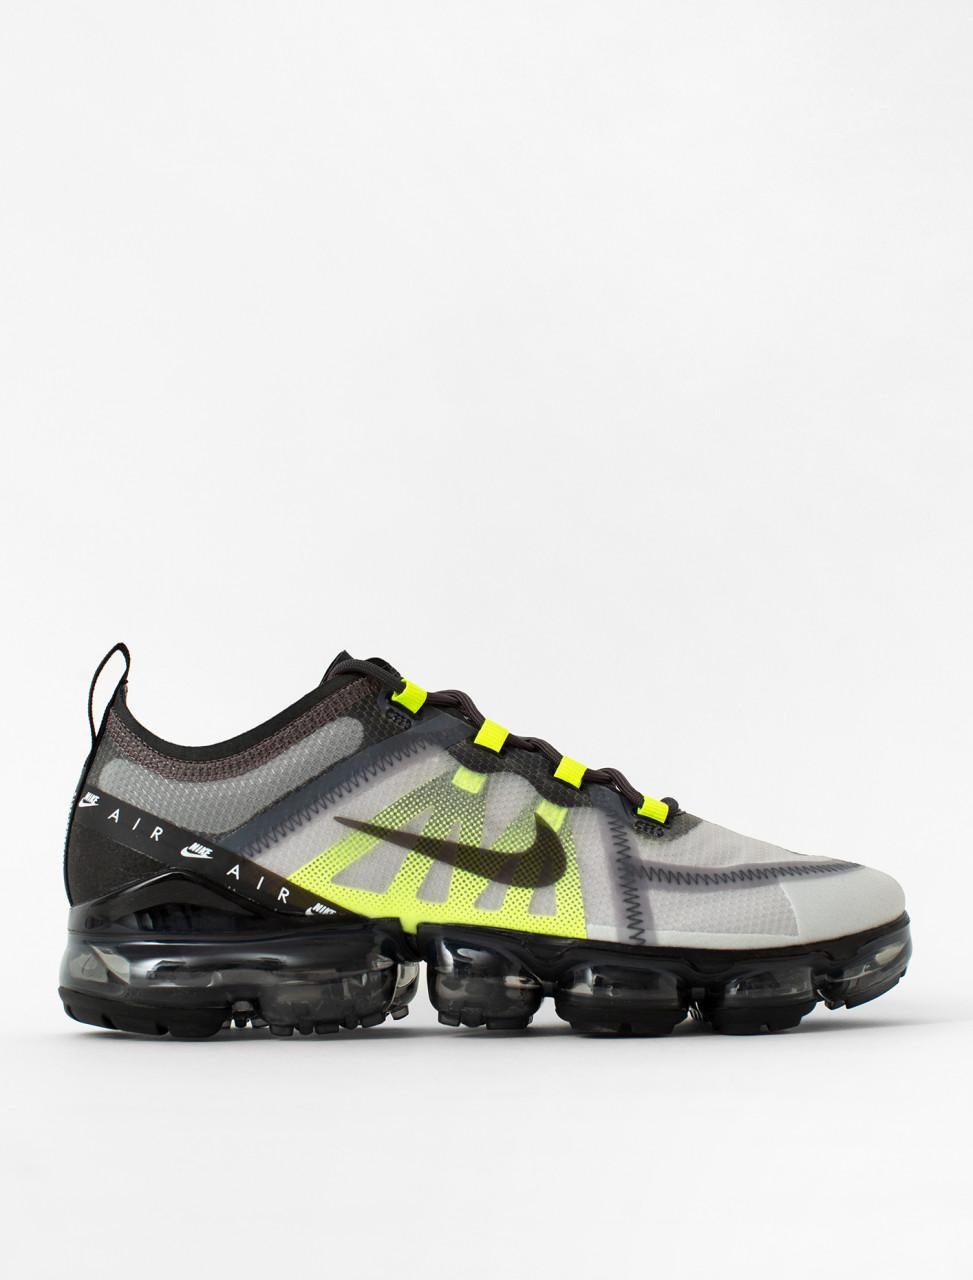 Air VaporMax 2019 LX Sneaker